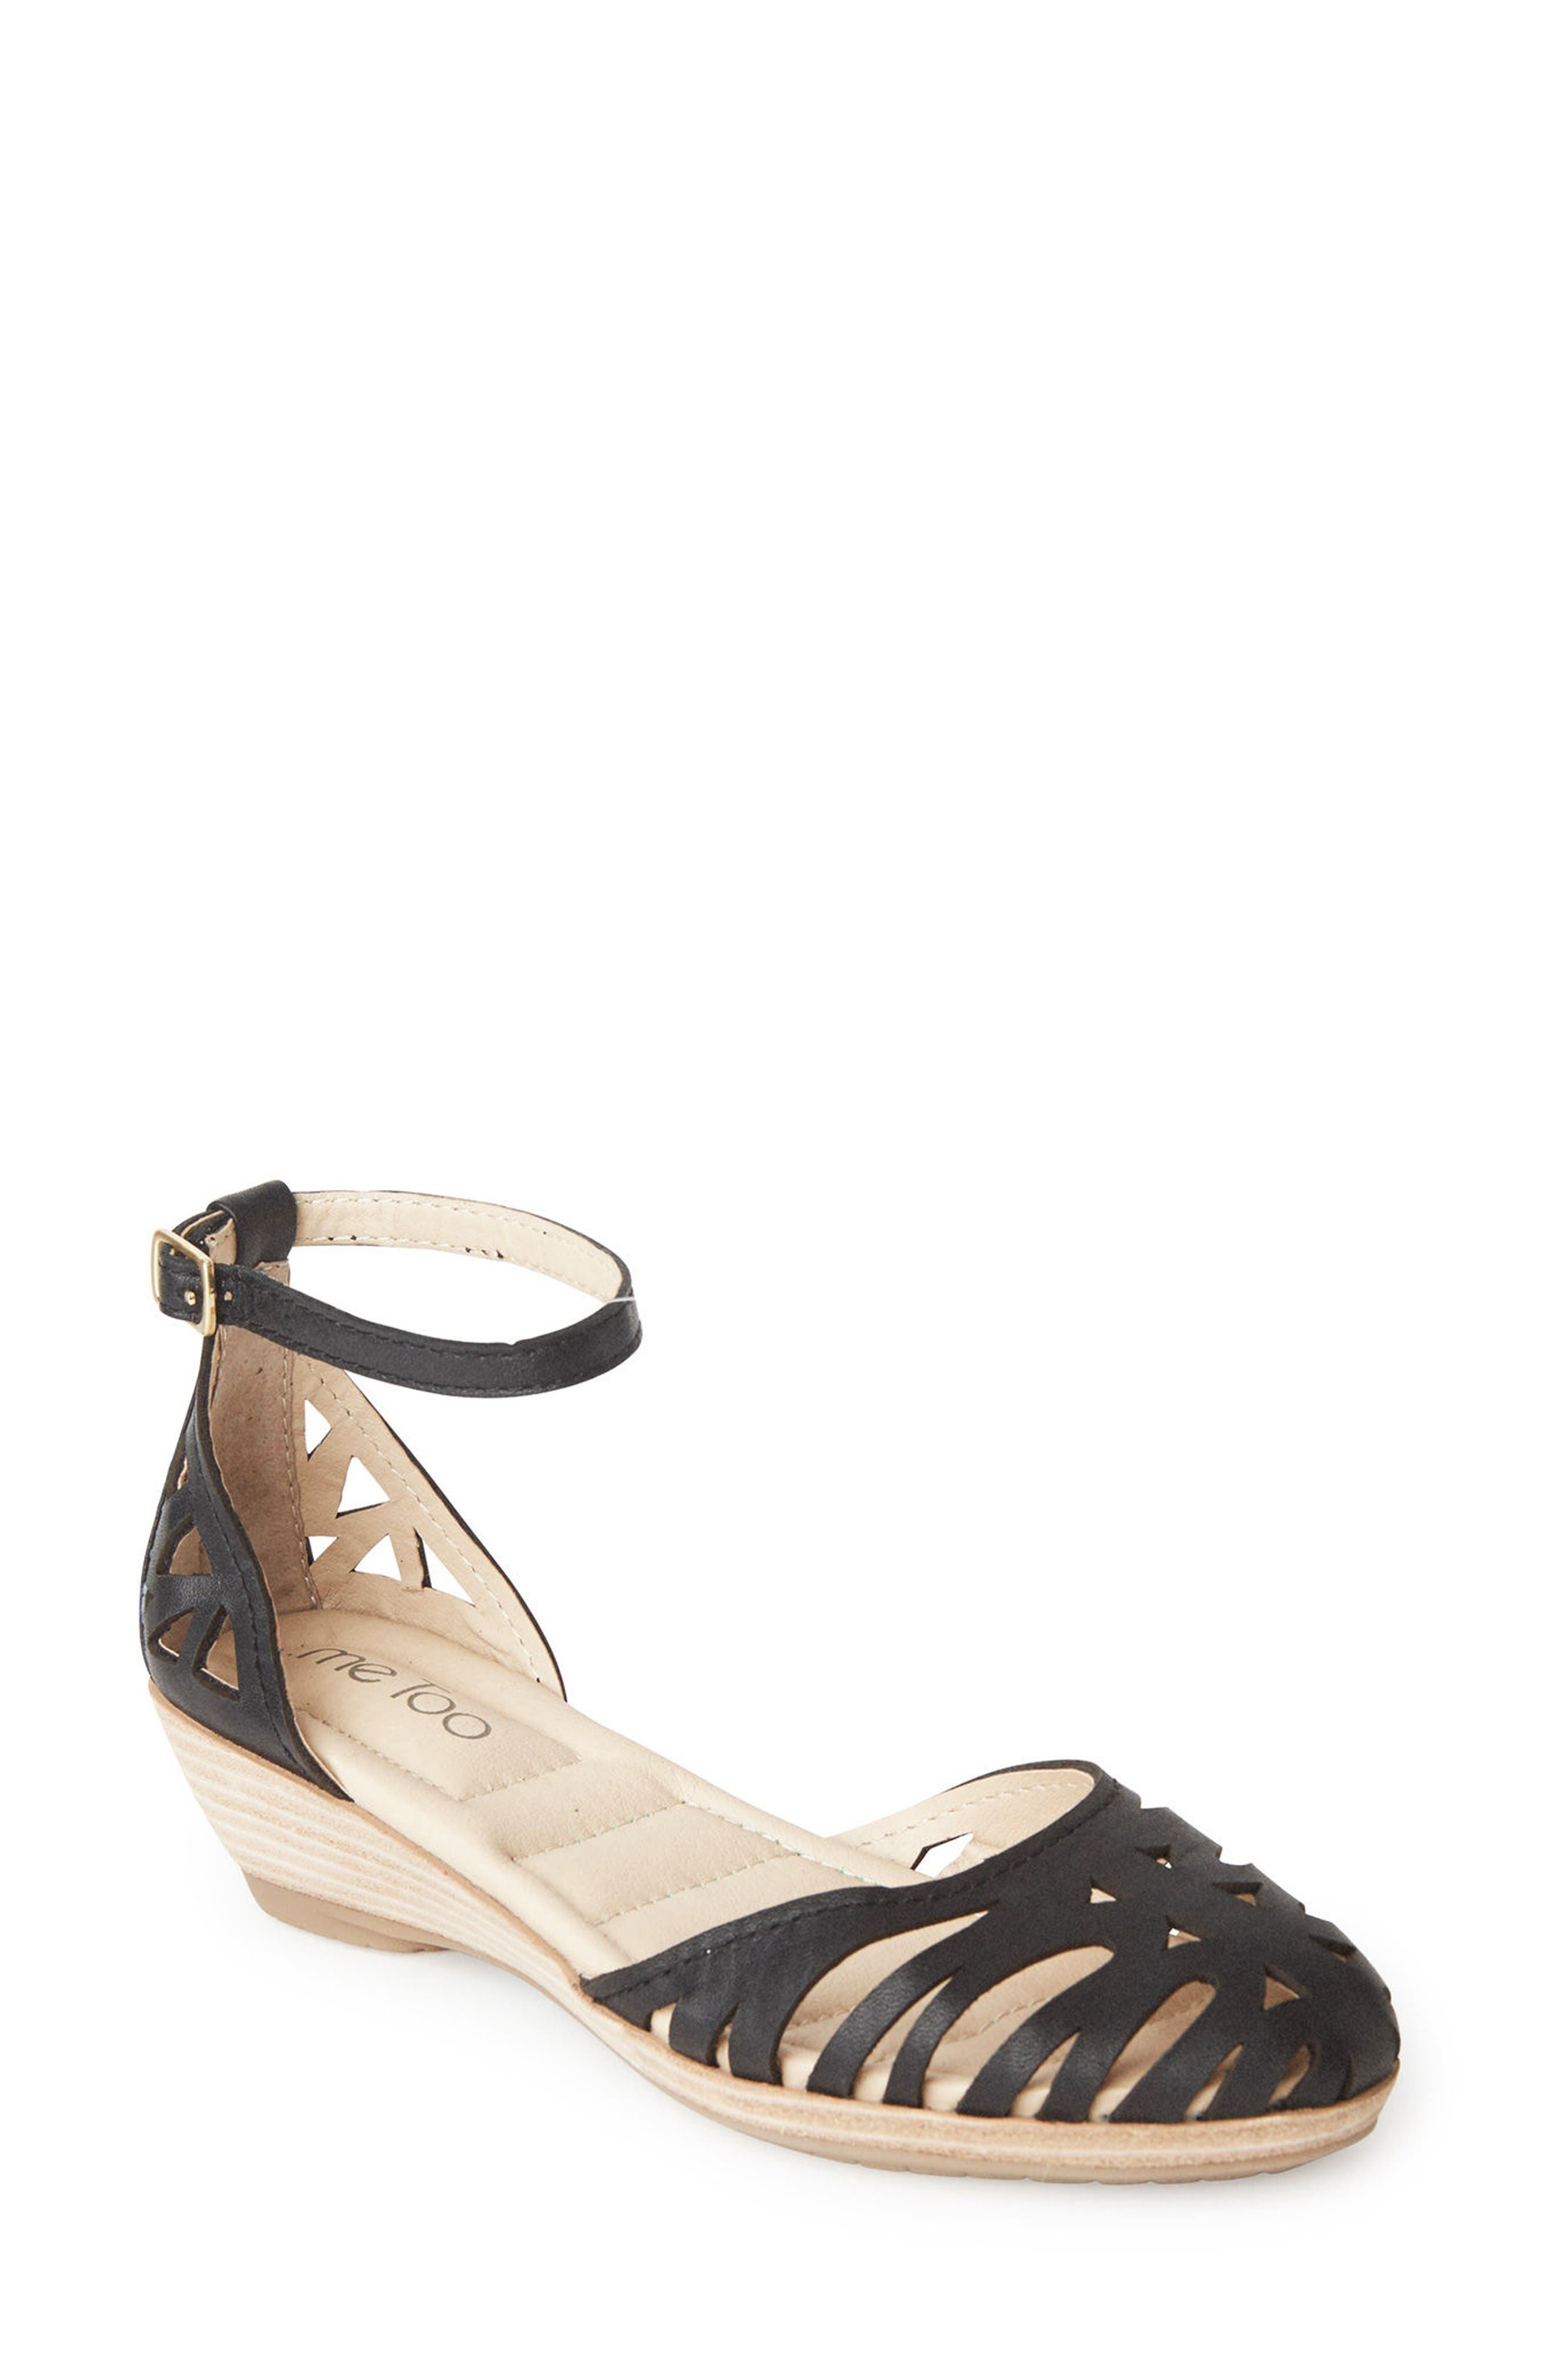 Alternate Image 1 Selected - Me Too Nalani Ankle Strap Sandal (Women)